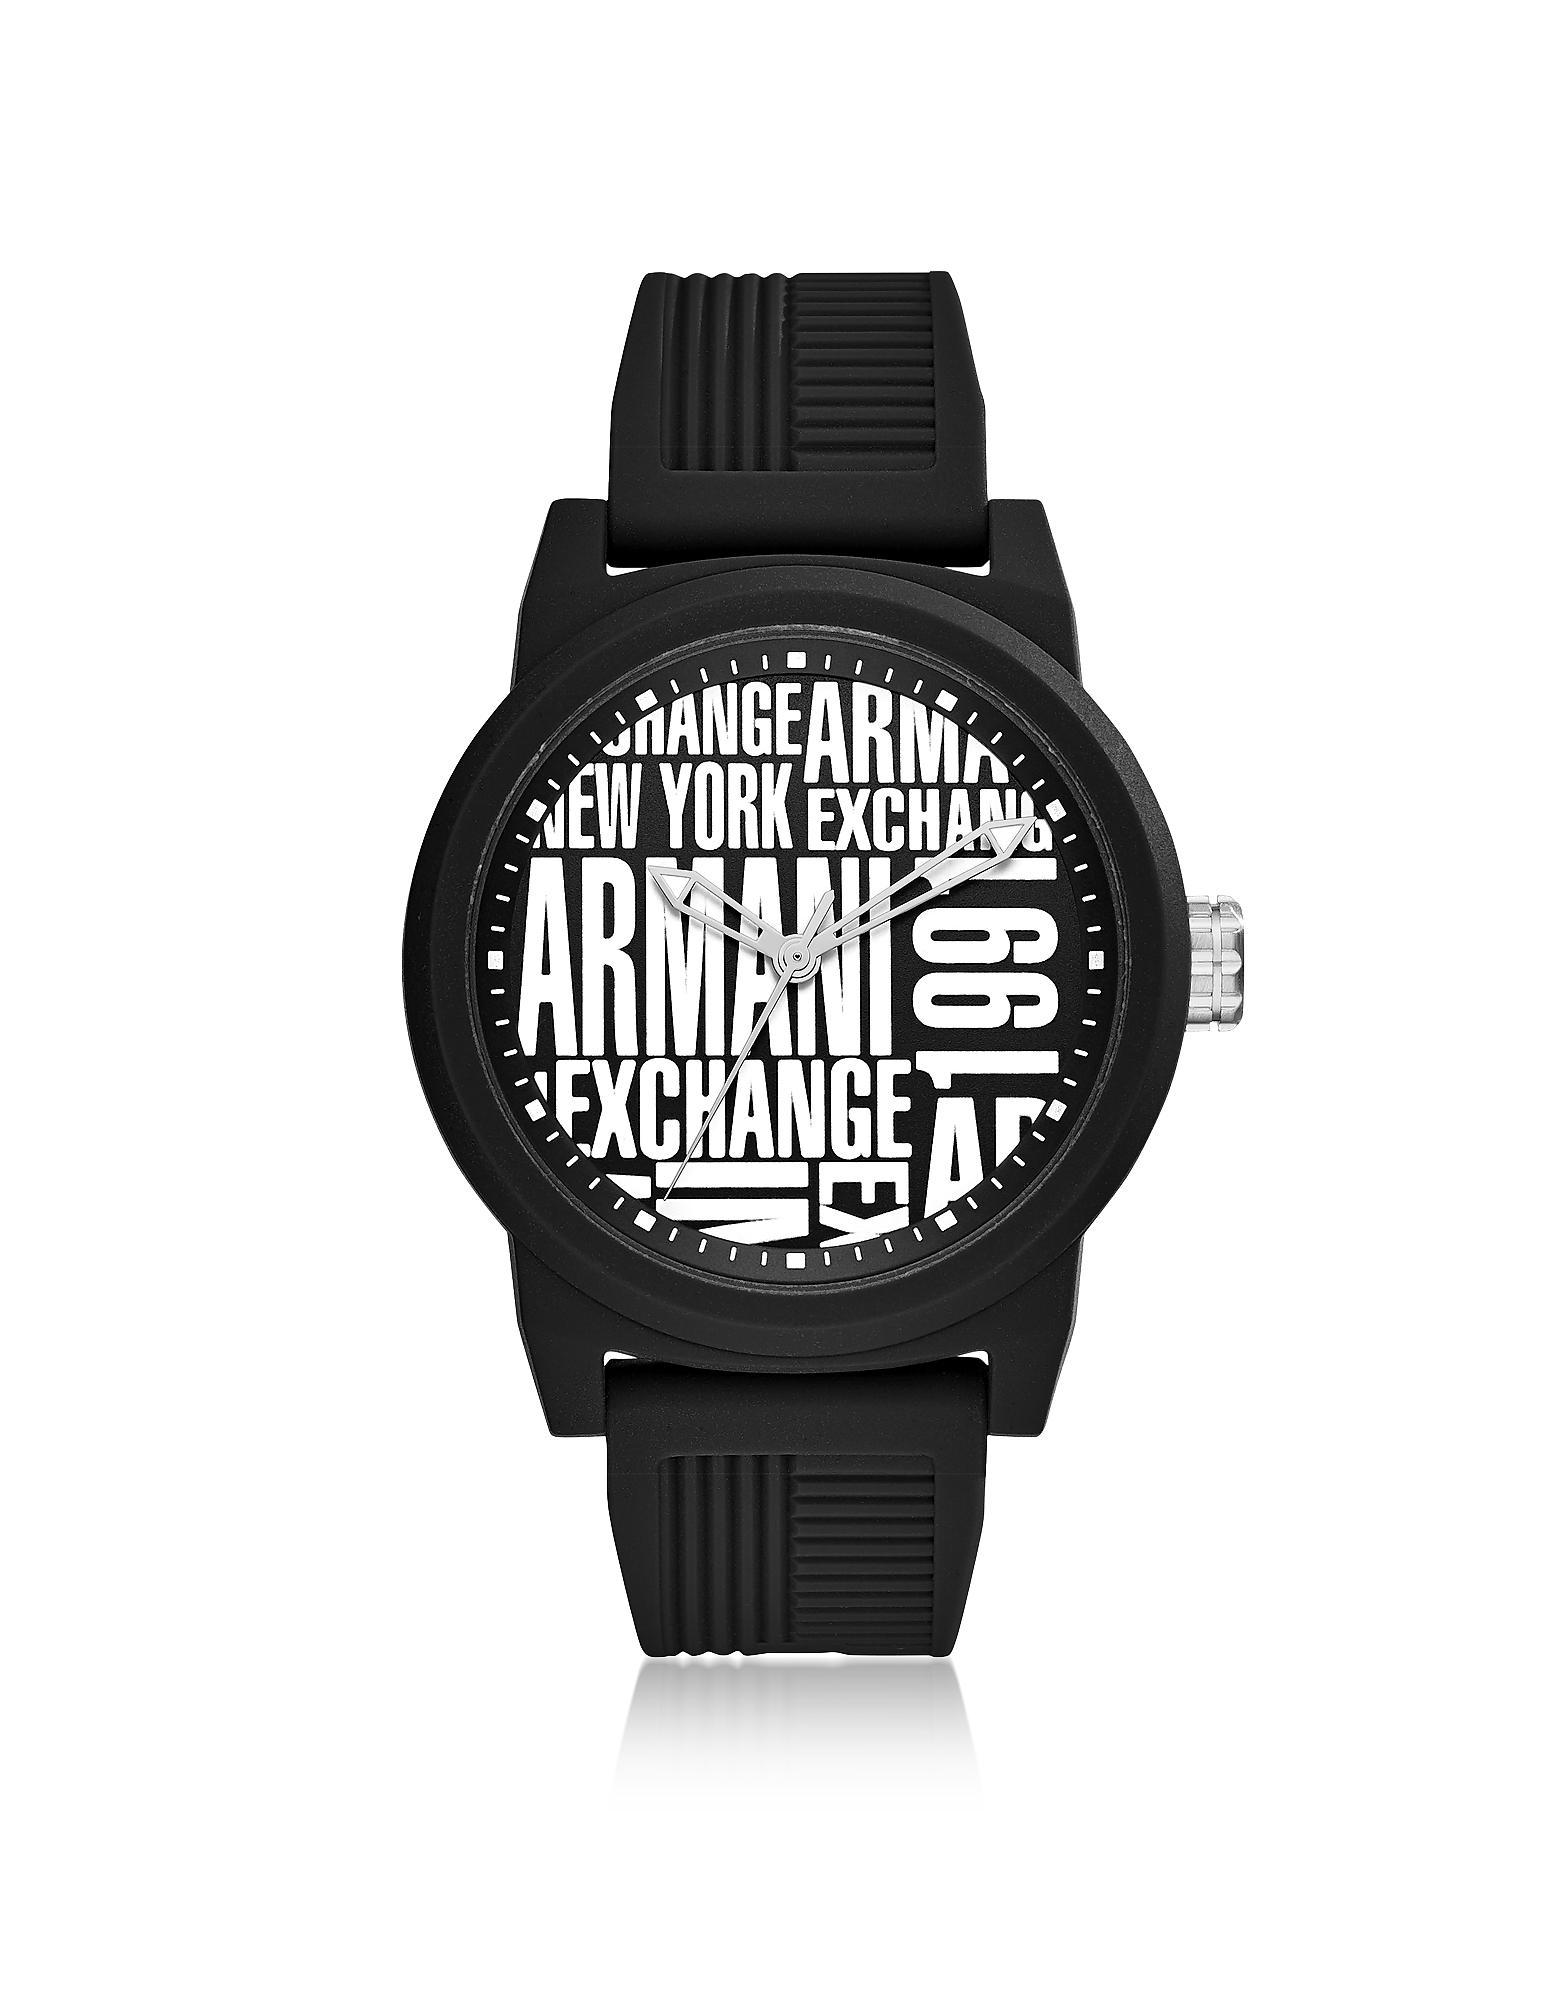 Armani Exchange Men's Watches, Atlc Black Silicone Men's Watch